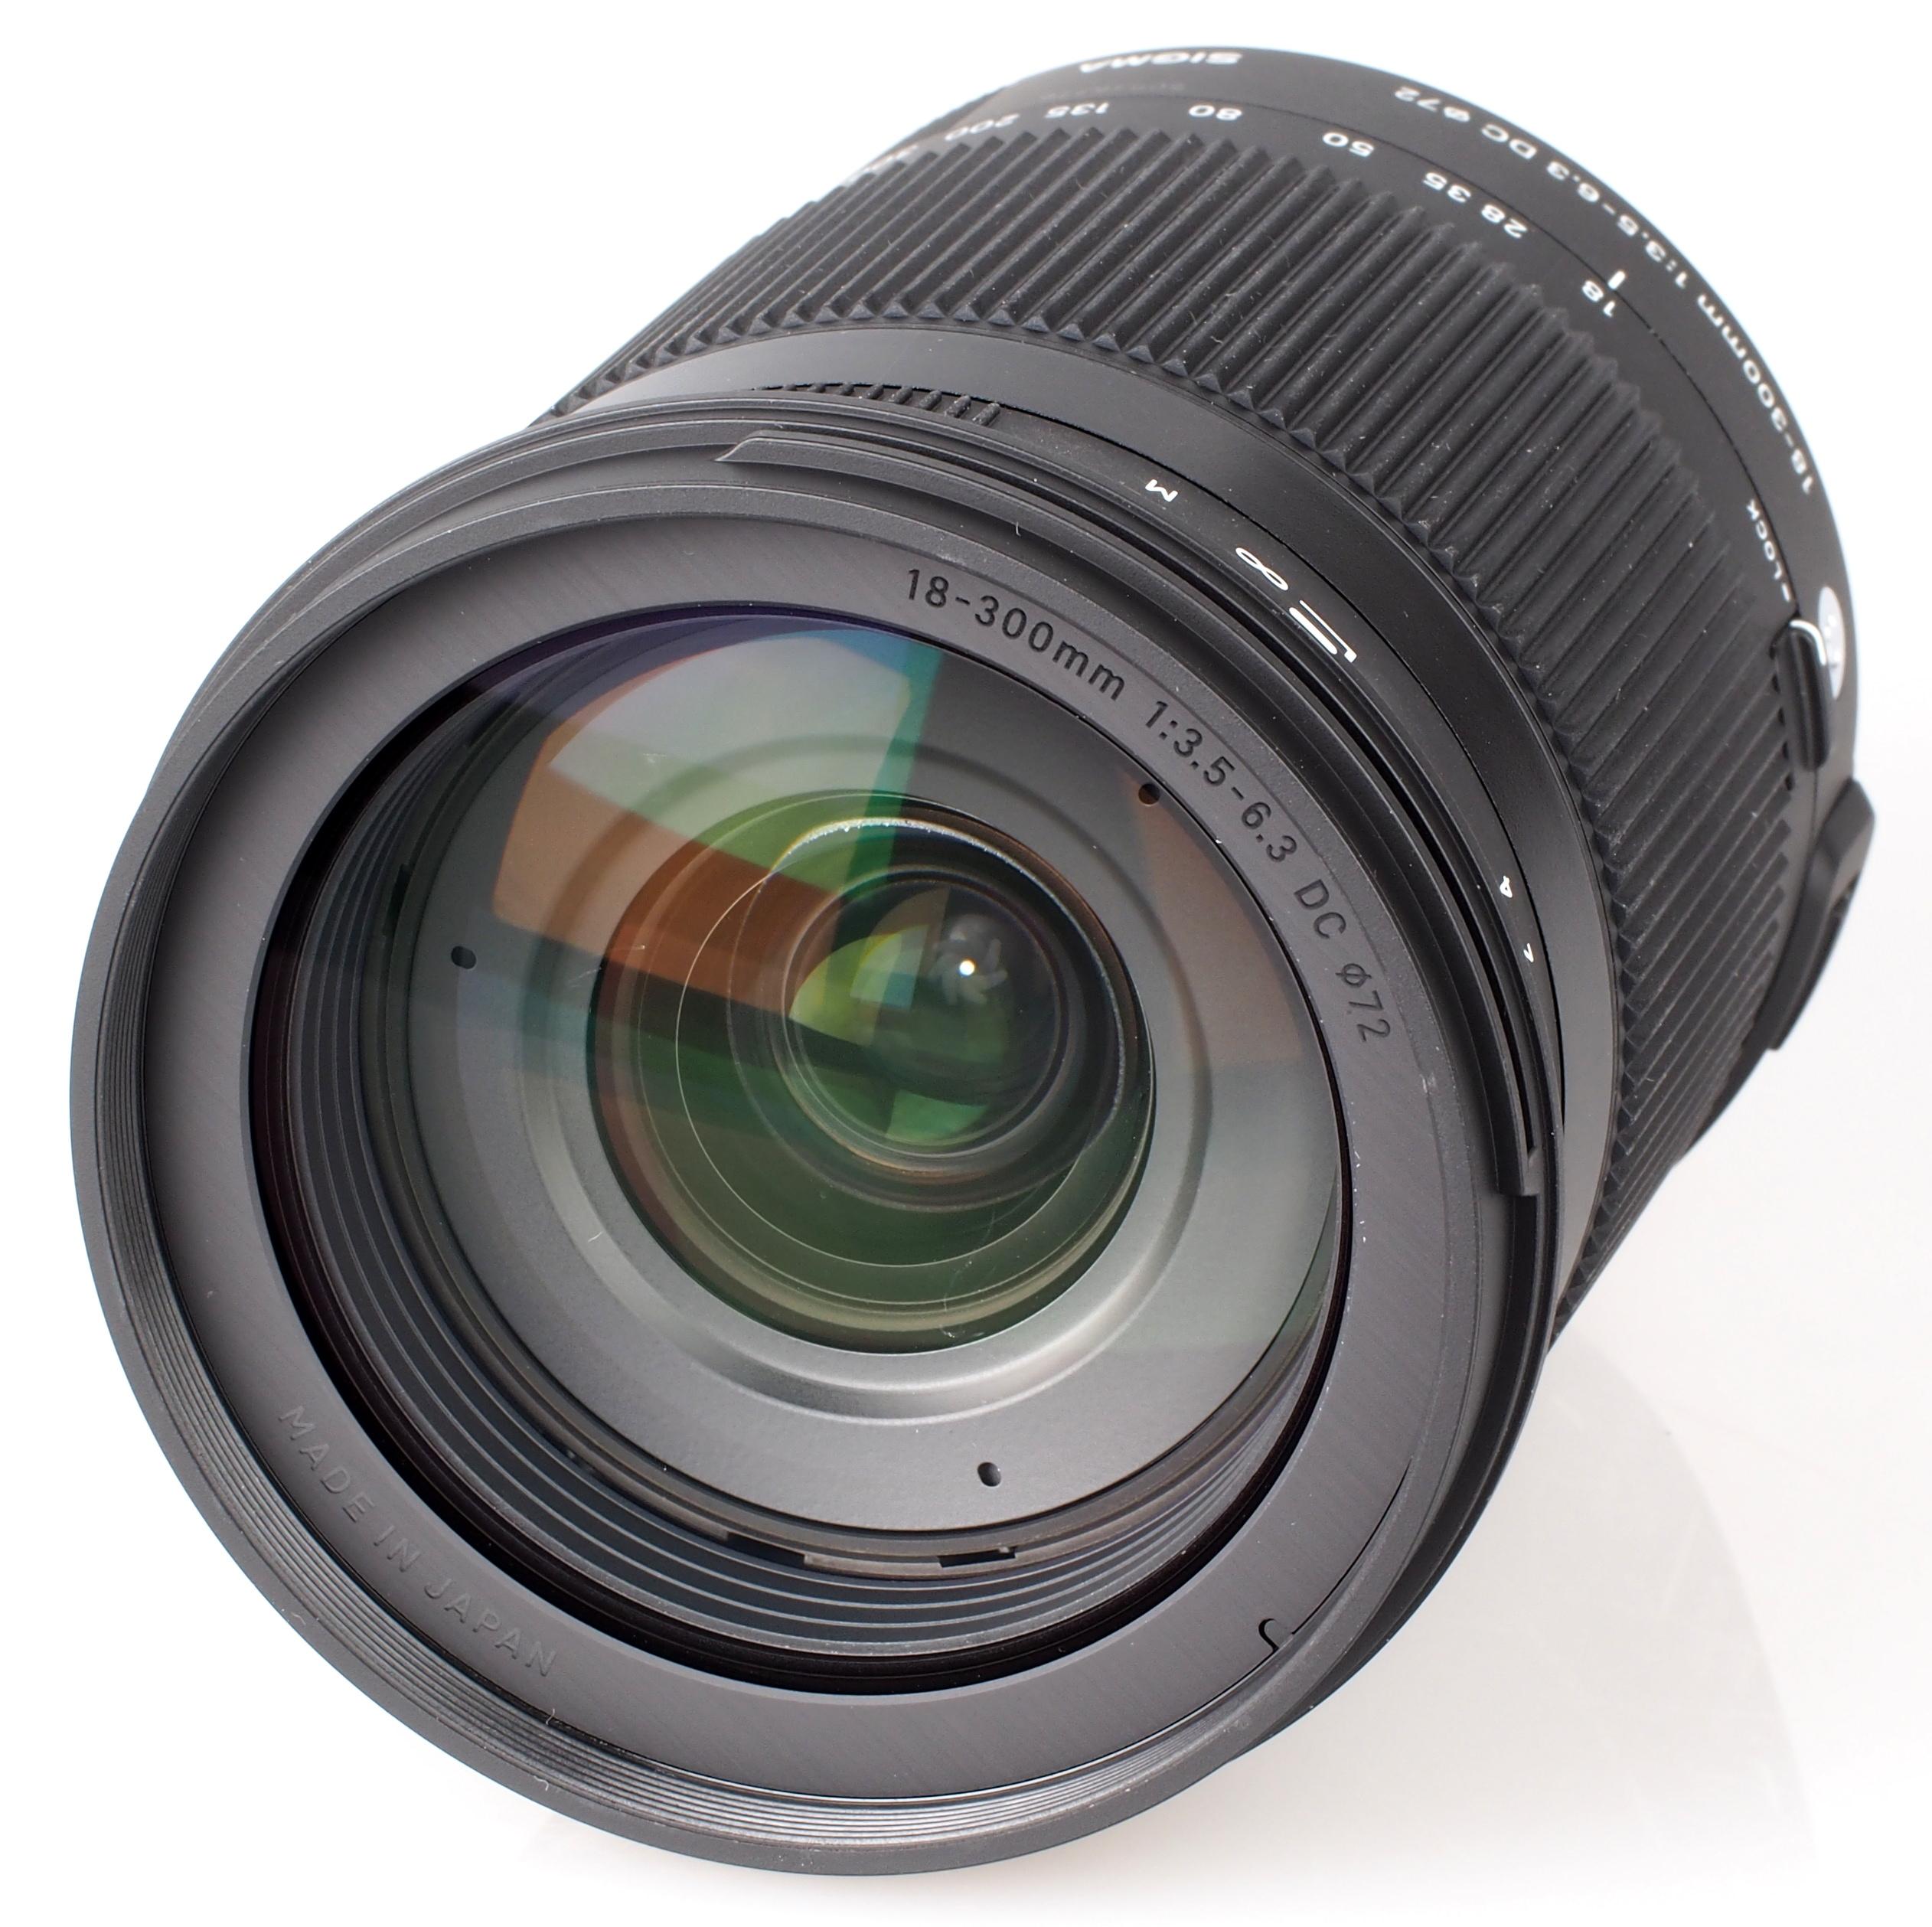 Sigma 18-300mm f/3.5-6.3 Macro OS HSM C Lens Review